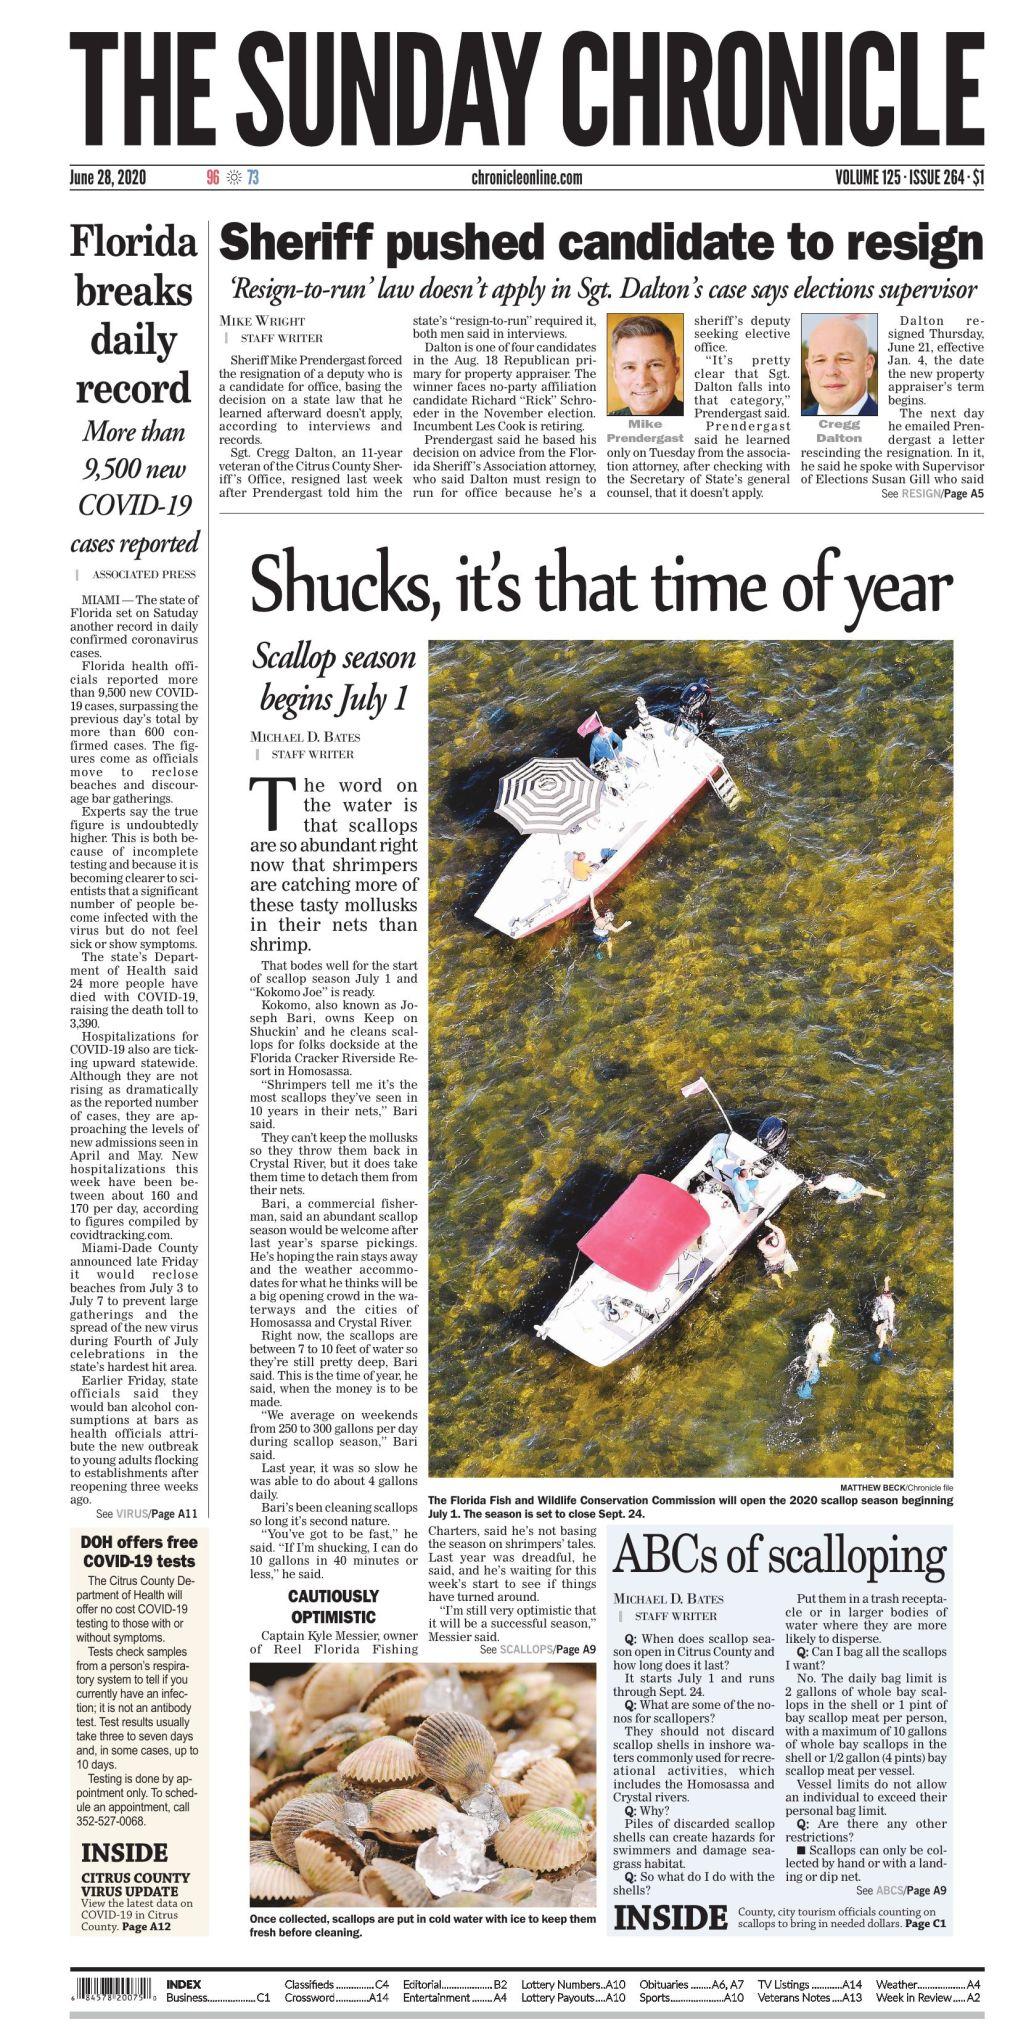 Citrus County Chronicle e-edition June 28, 2020